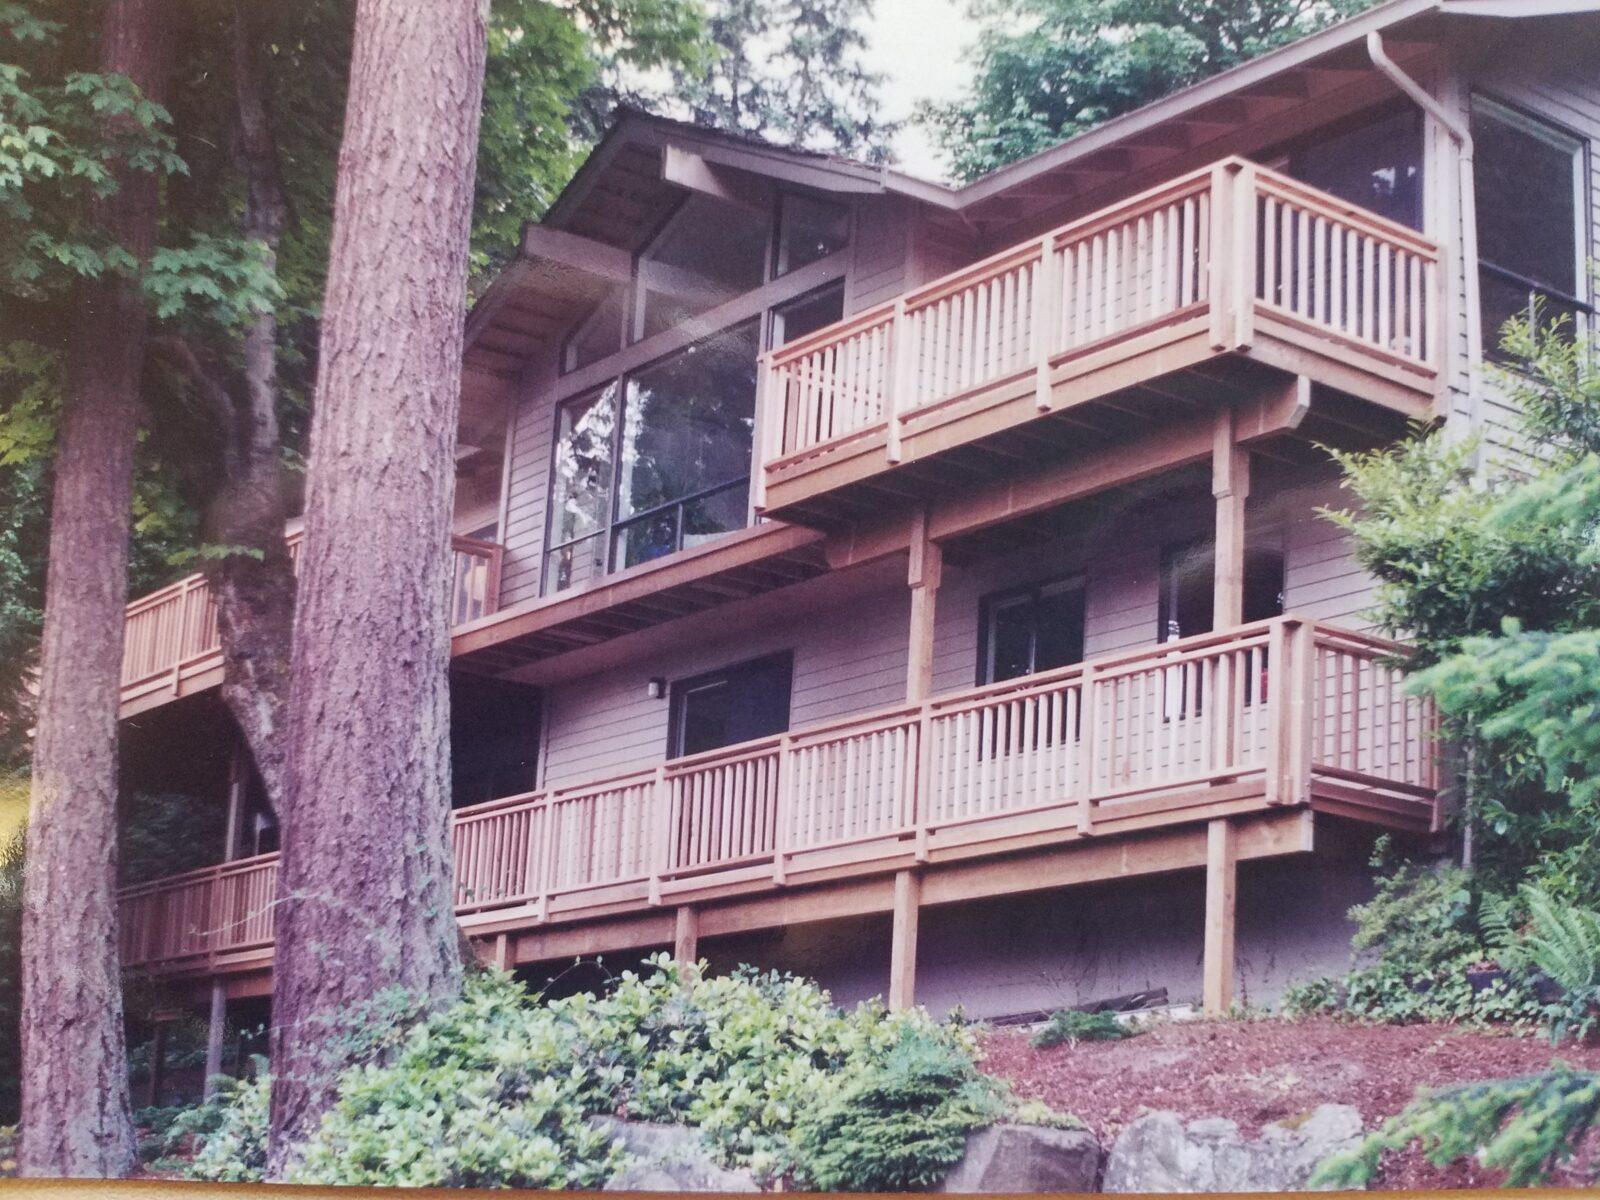 2 level deck